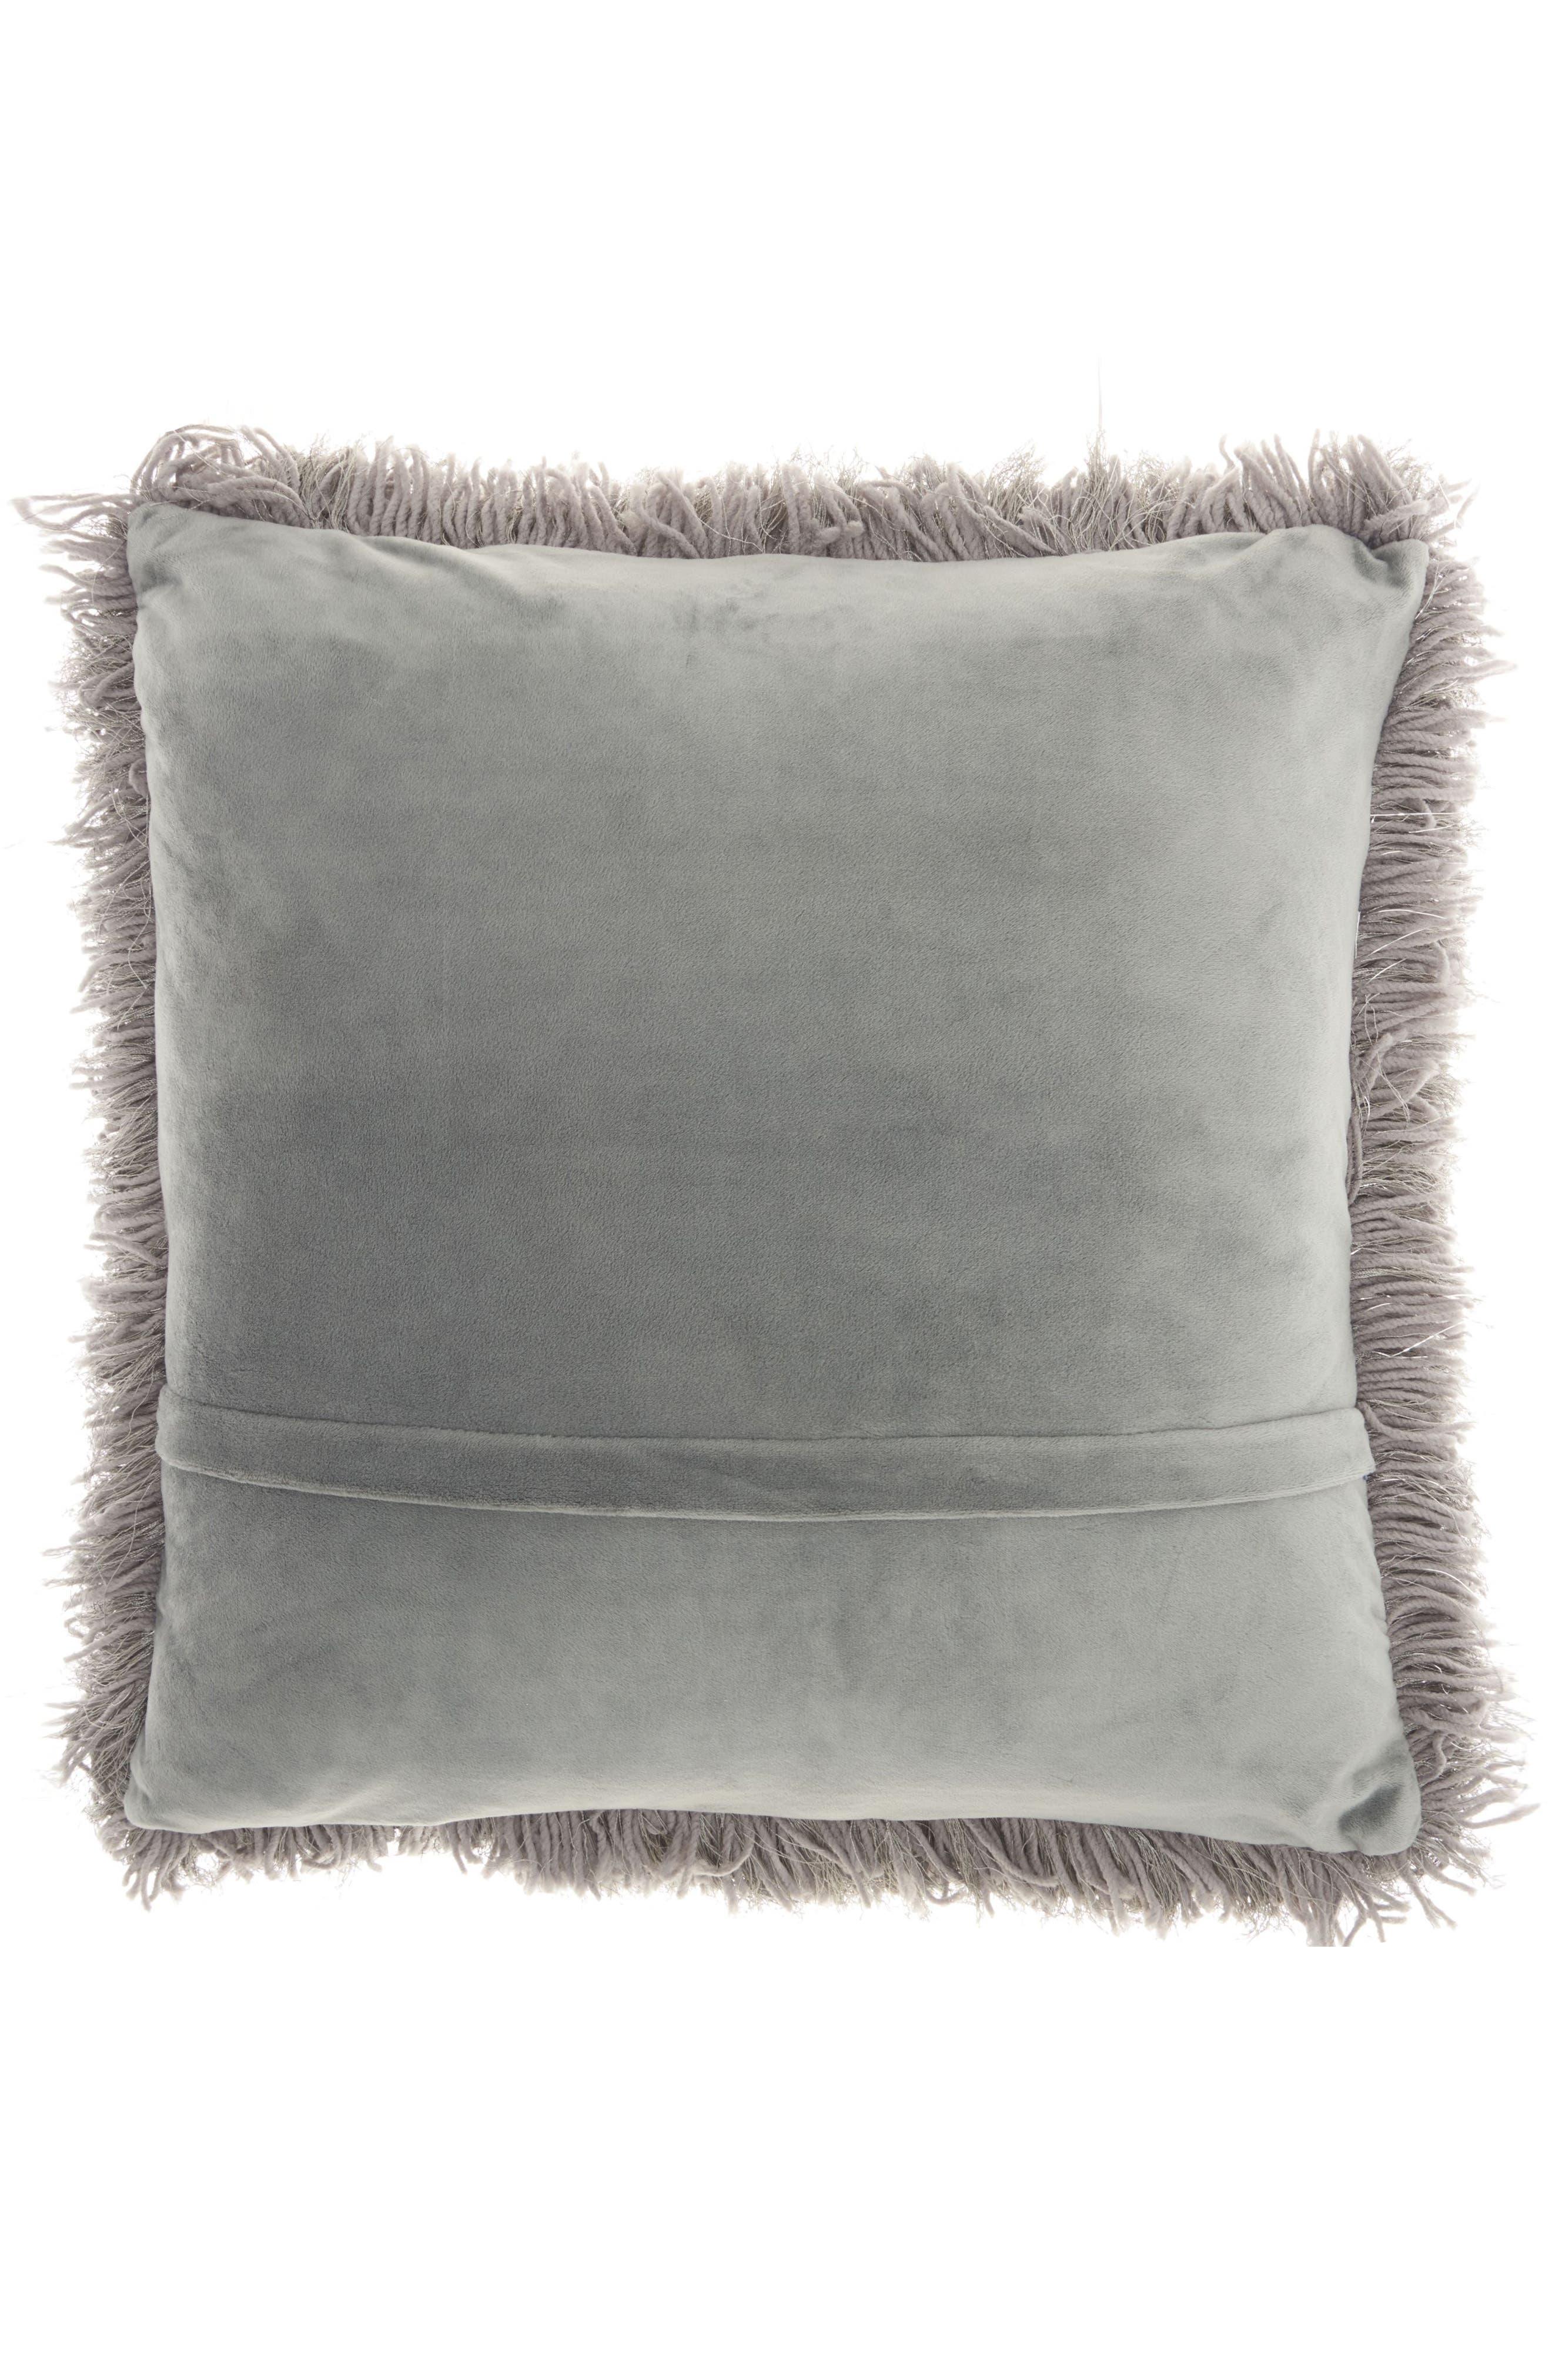 Shag Pillow,                             Alternate thumbnail 2, color,                             020